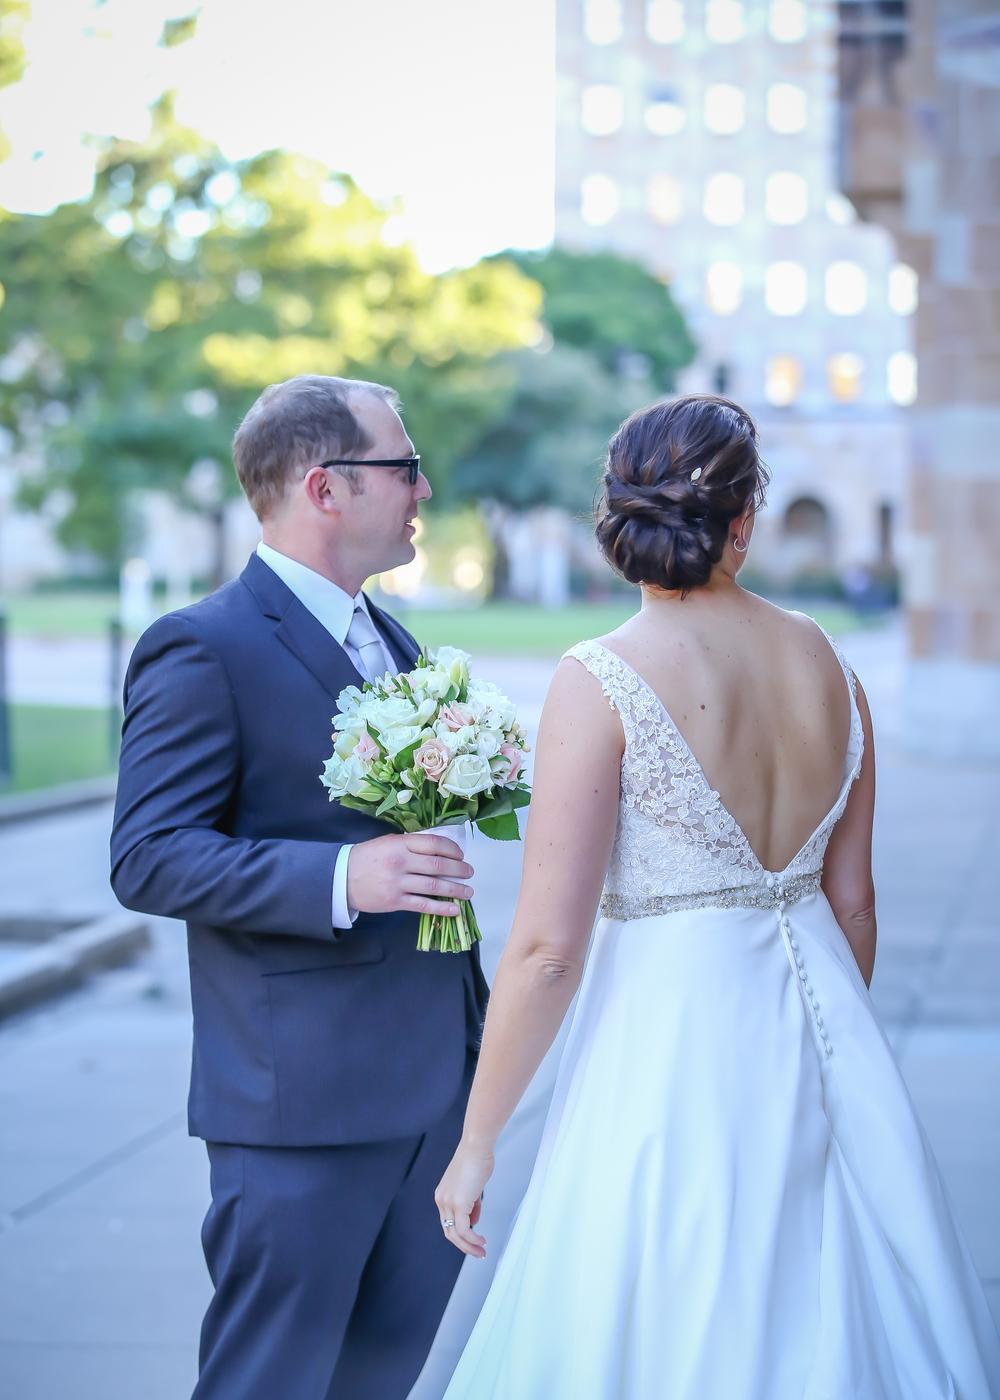 Wedding photographer - Raw Design Media